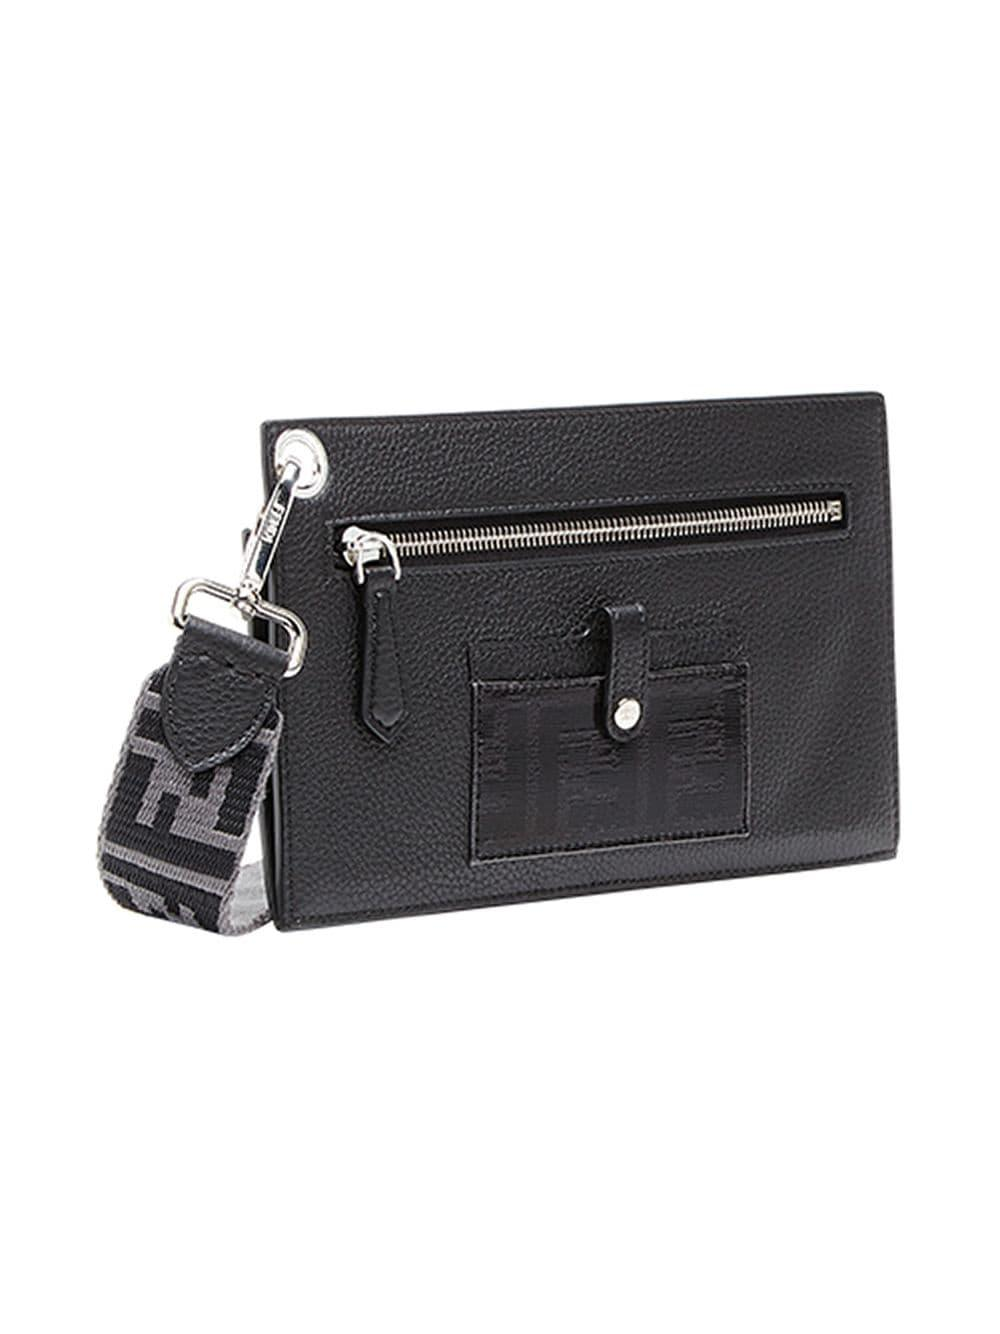 6bbc6775220d Fendi - Black Small Travel Clutch Bag for Men - Lyst. View fullscreen